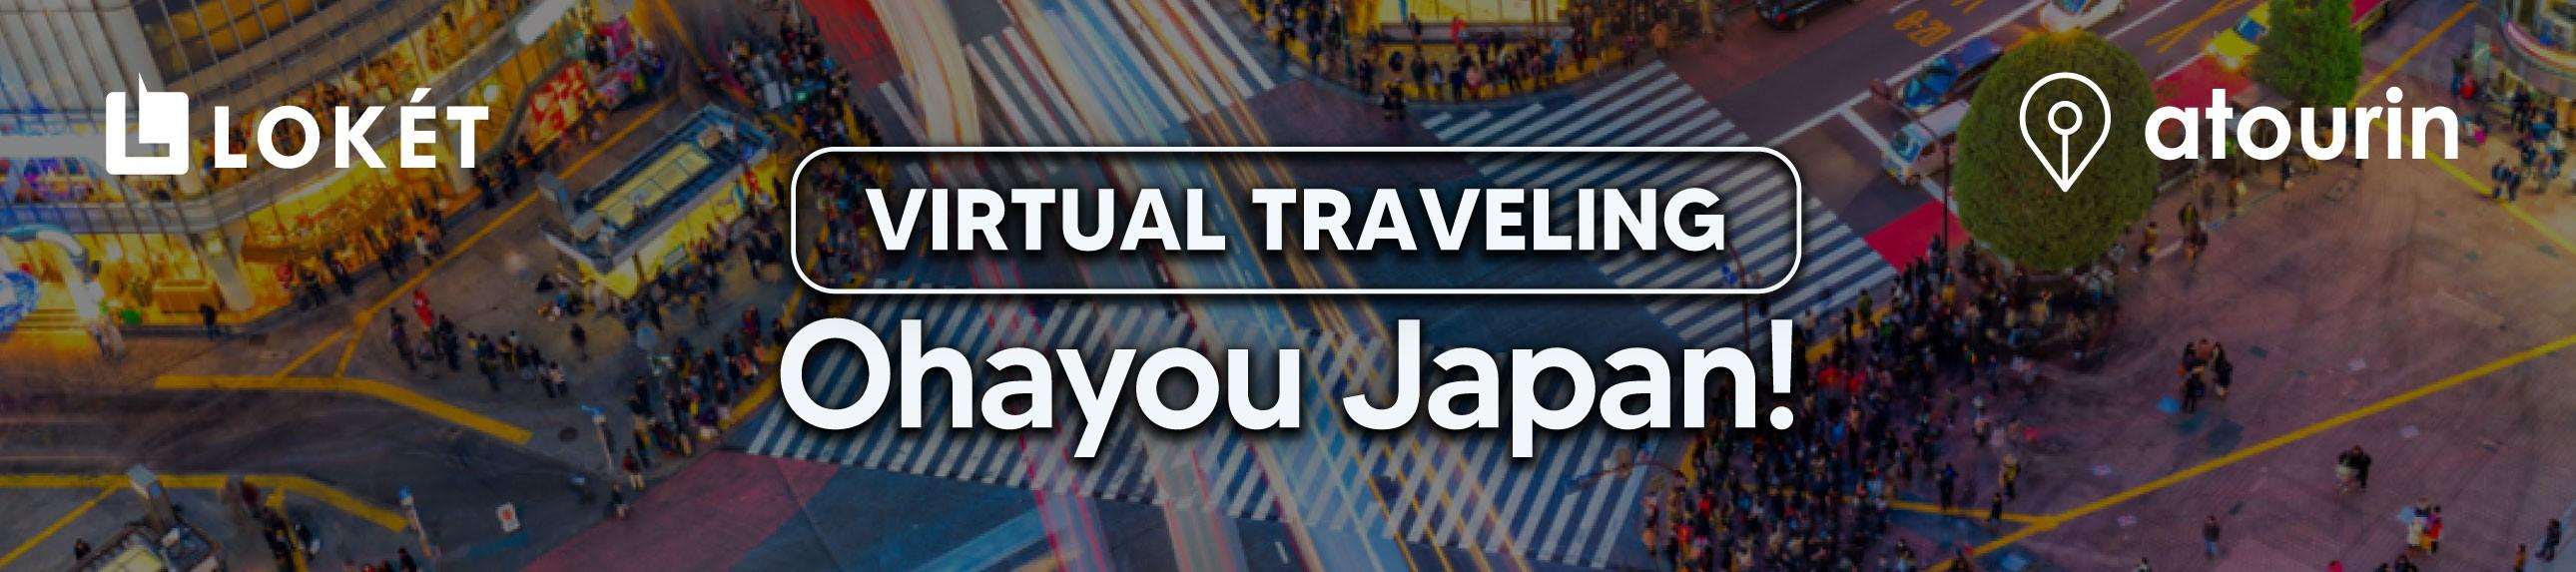 Virtual Traveling - Ohayou Japan!